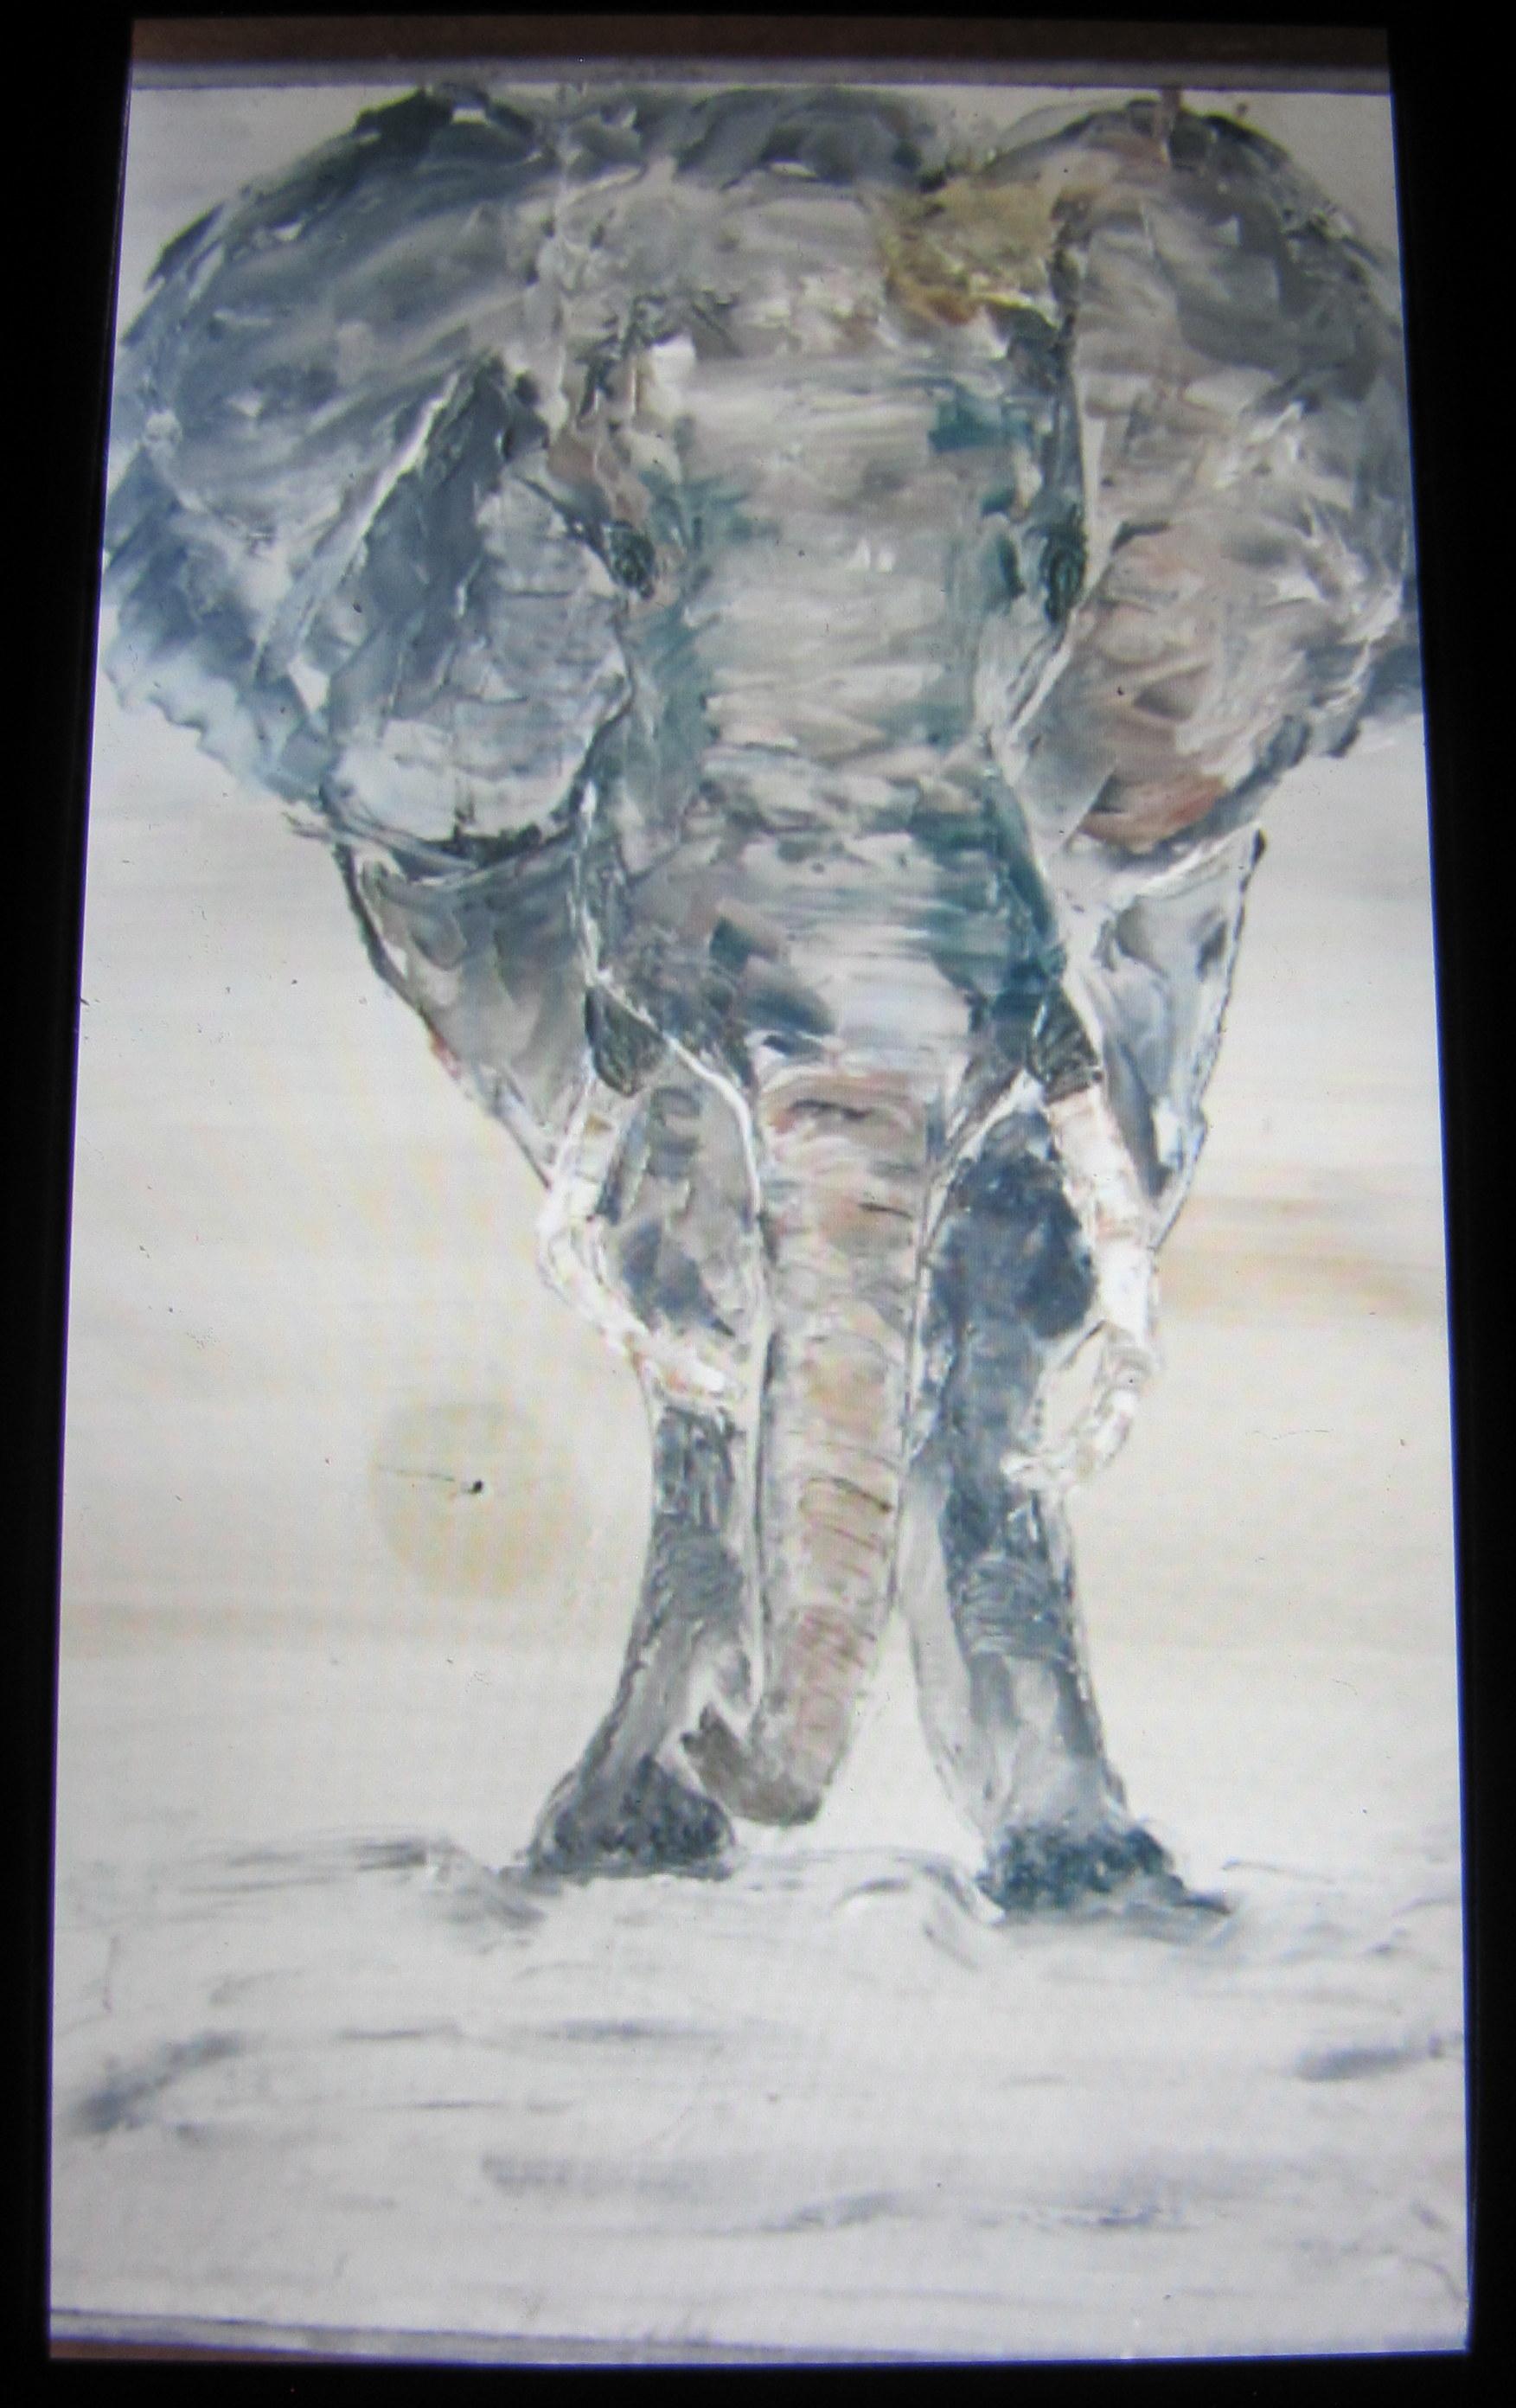 Elephant - Reclaimed Wood - 12X18 - $75.00